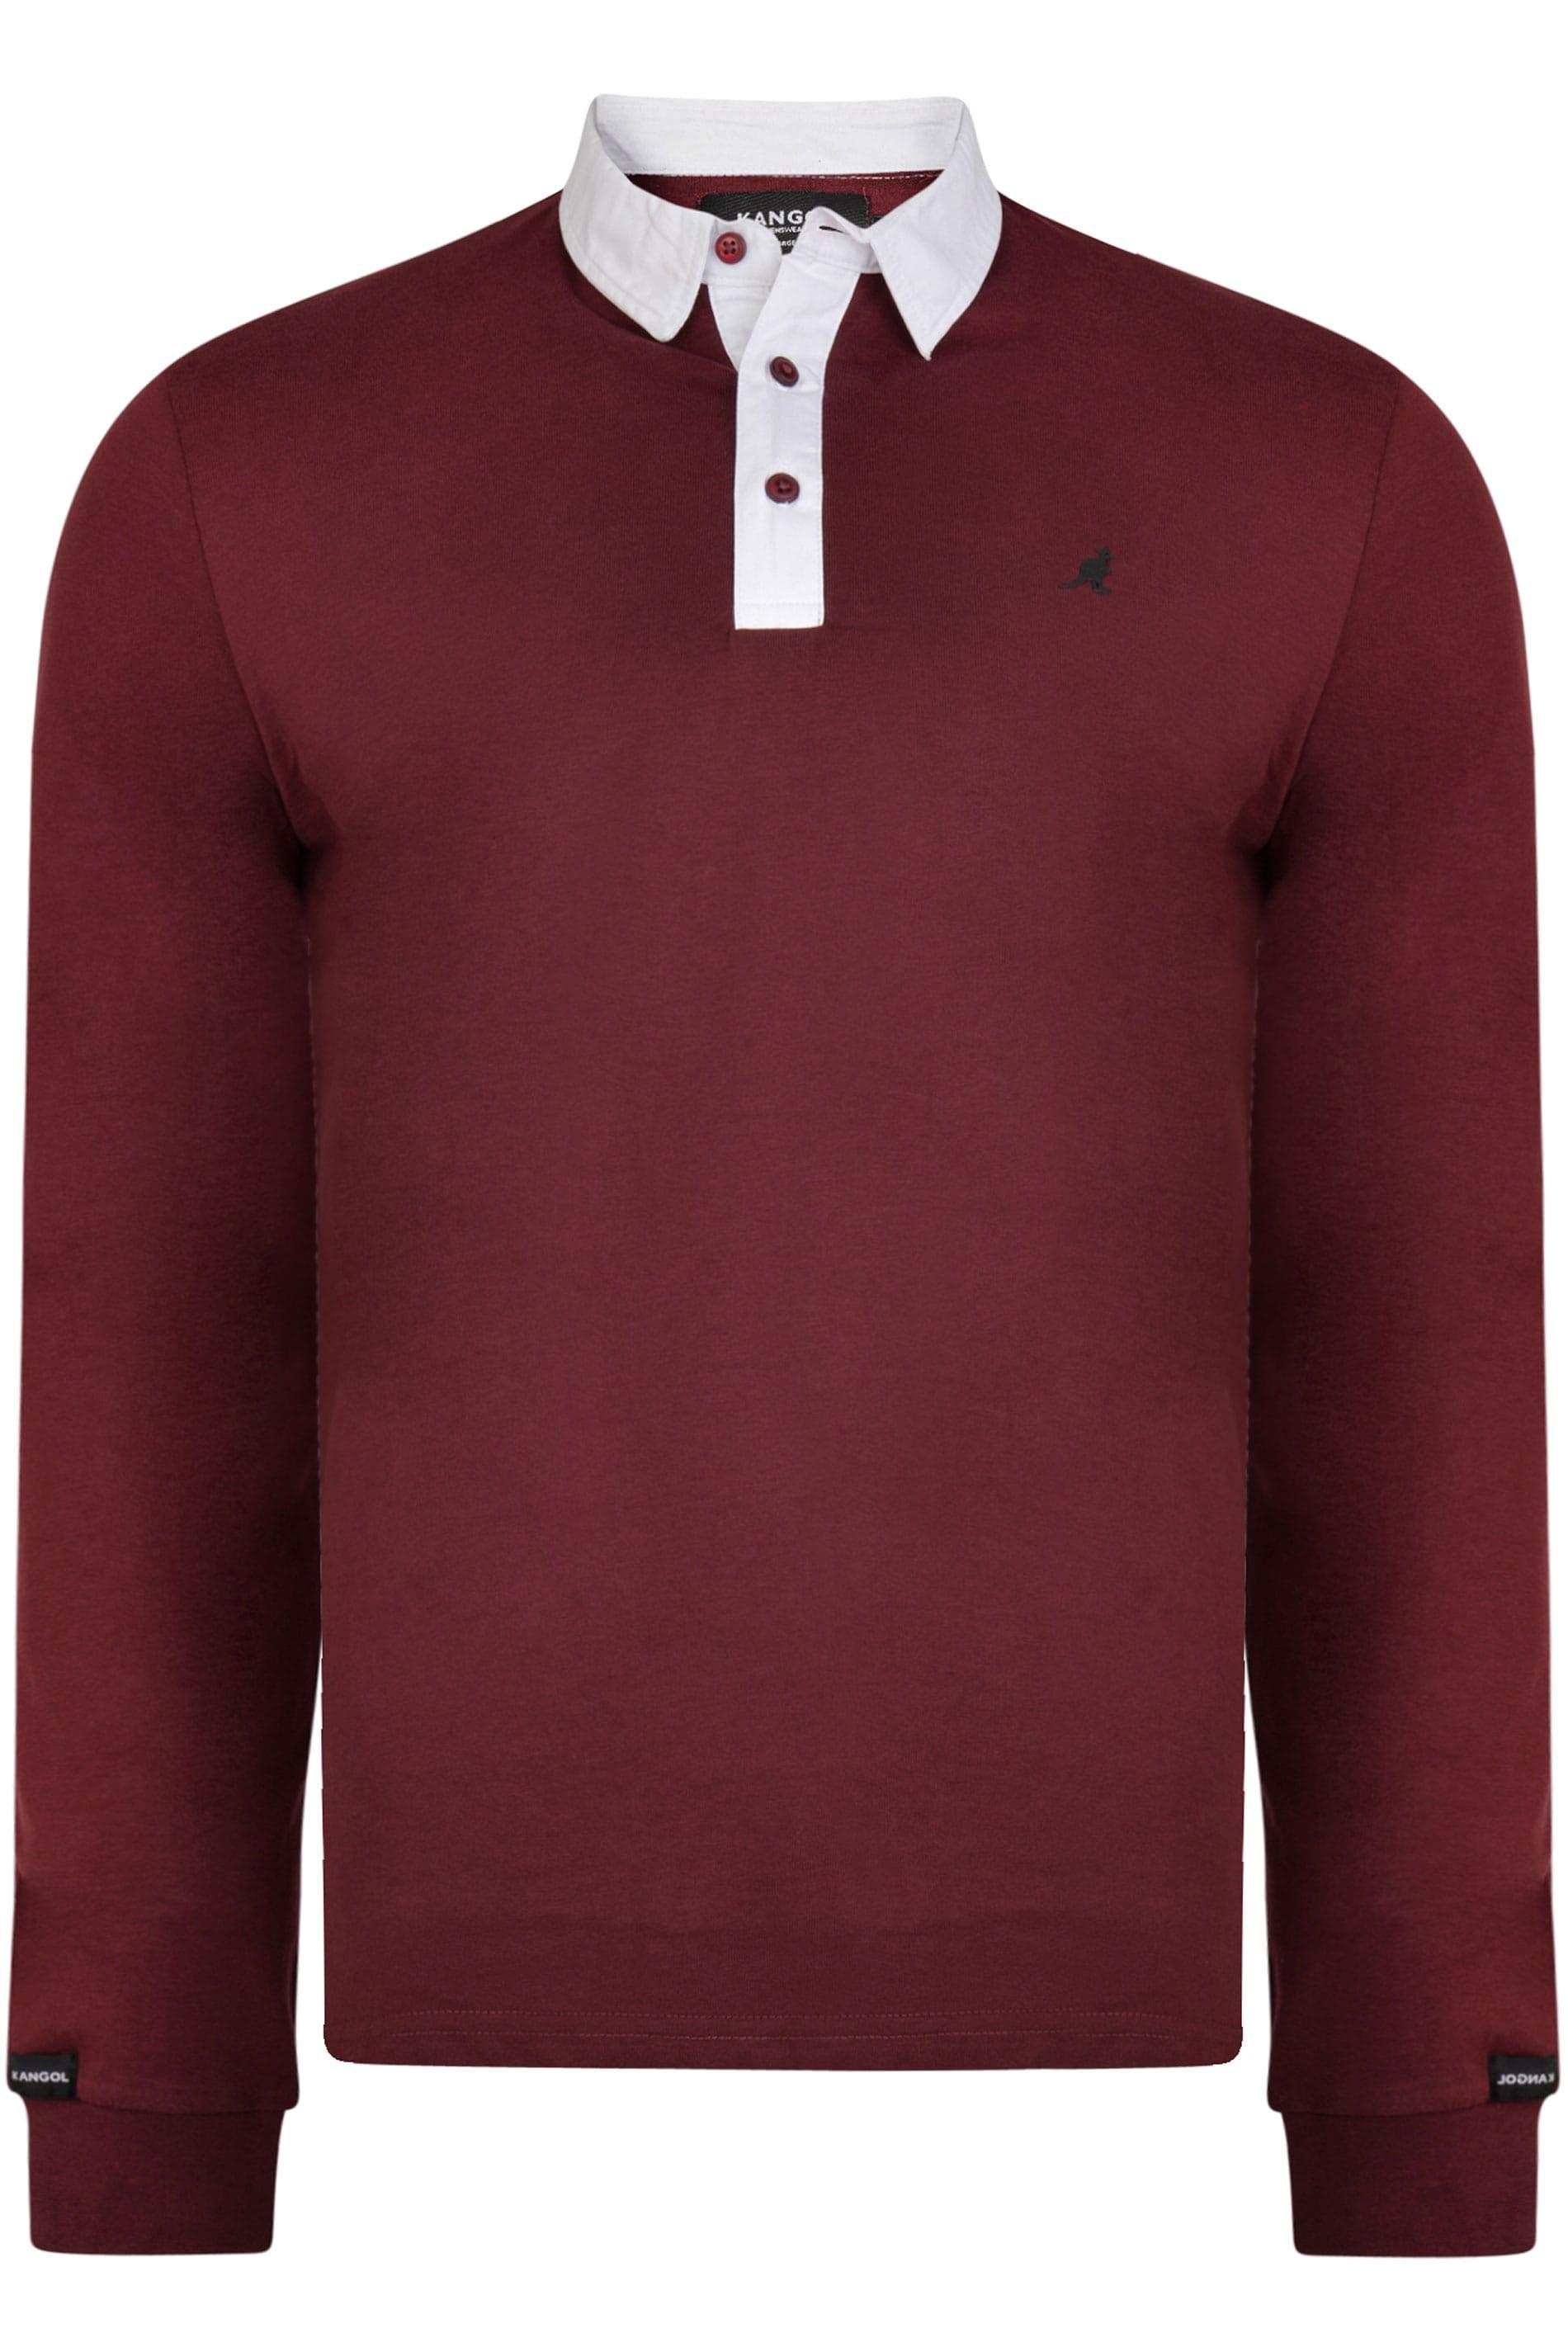 Kangol Burgundy Long Sleeve Polo Shirt